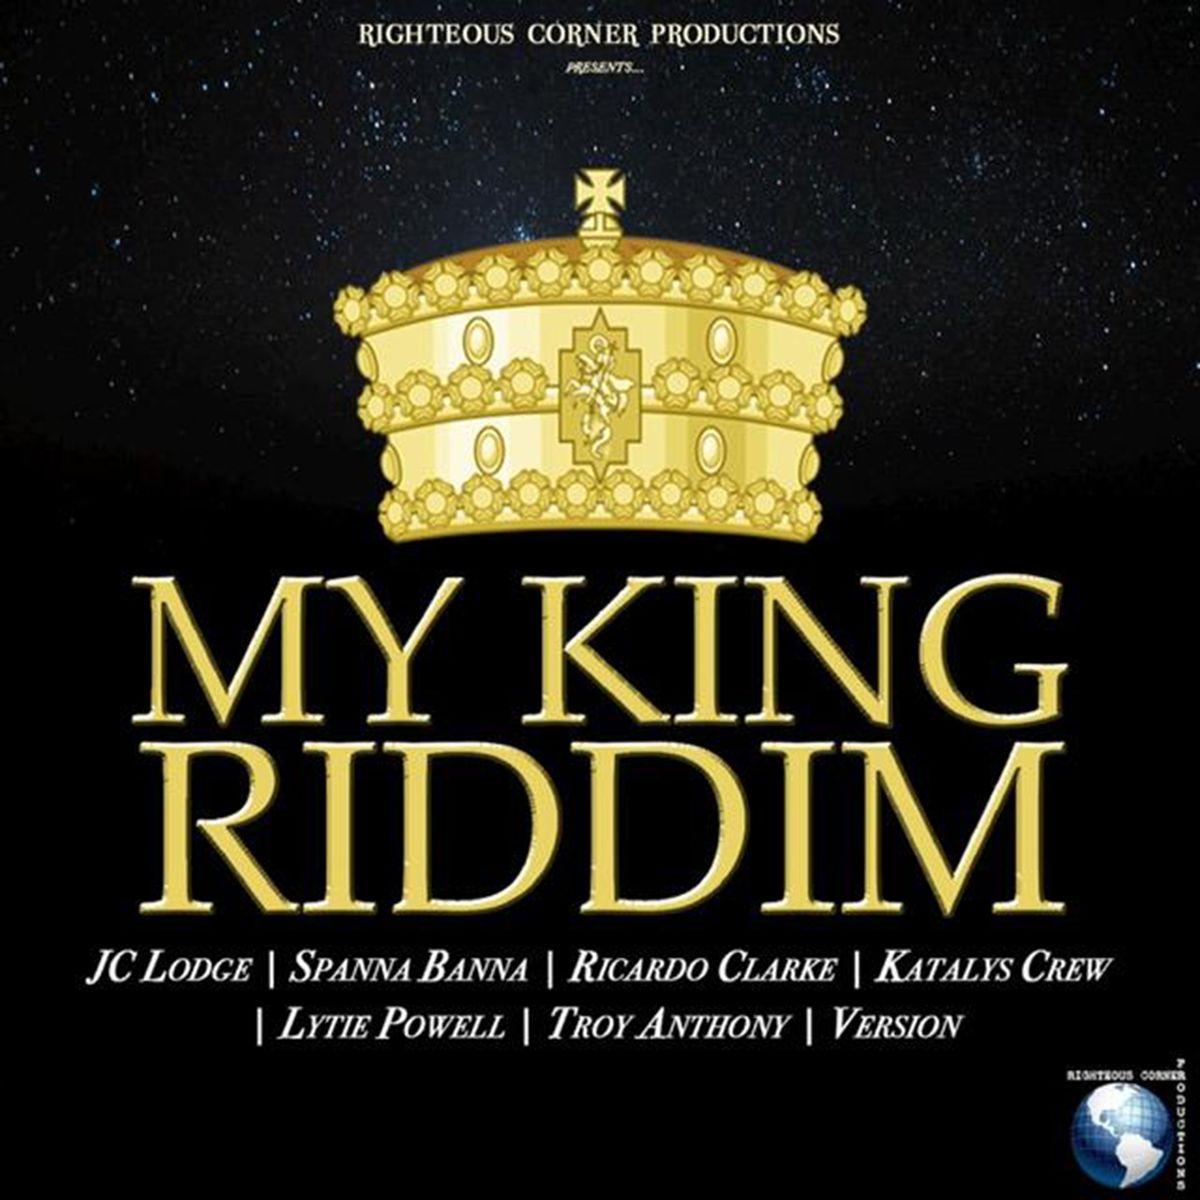 MY KING RIDDIM (REGGAE) - RIGHTEOUS CORNER PRODUCTIONS